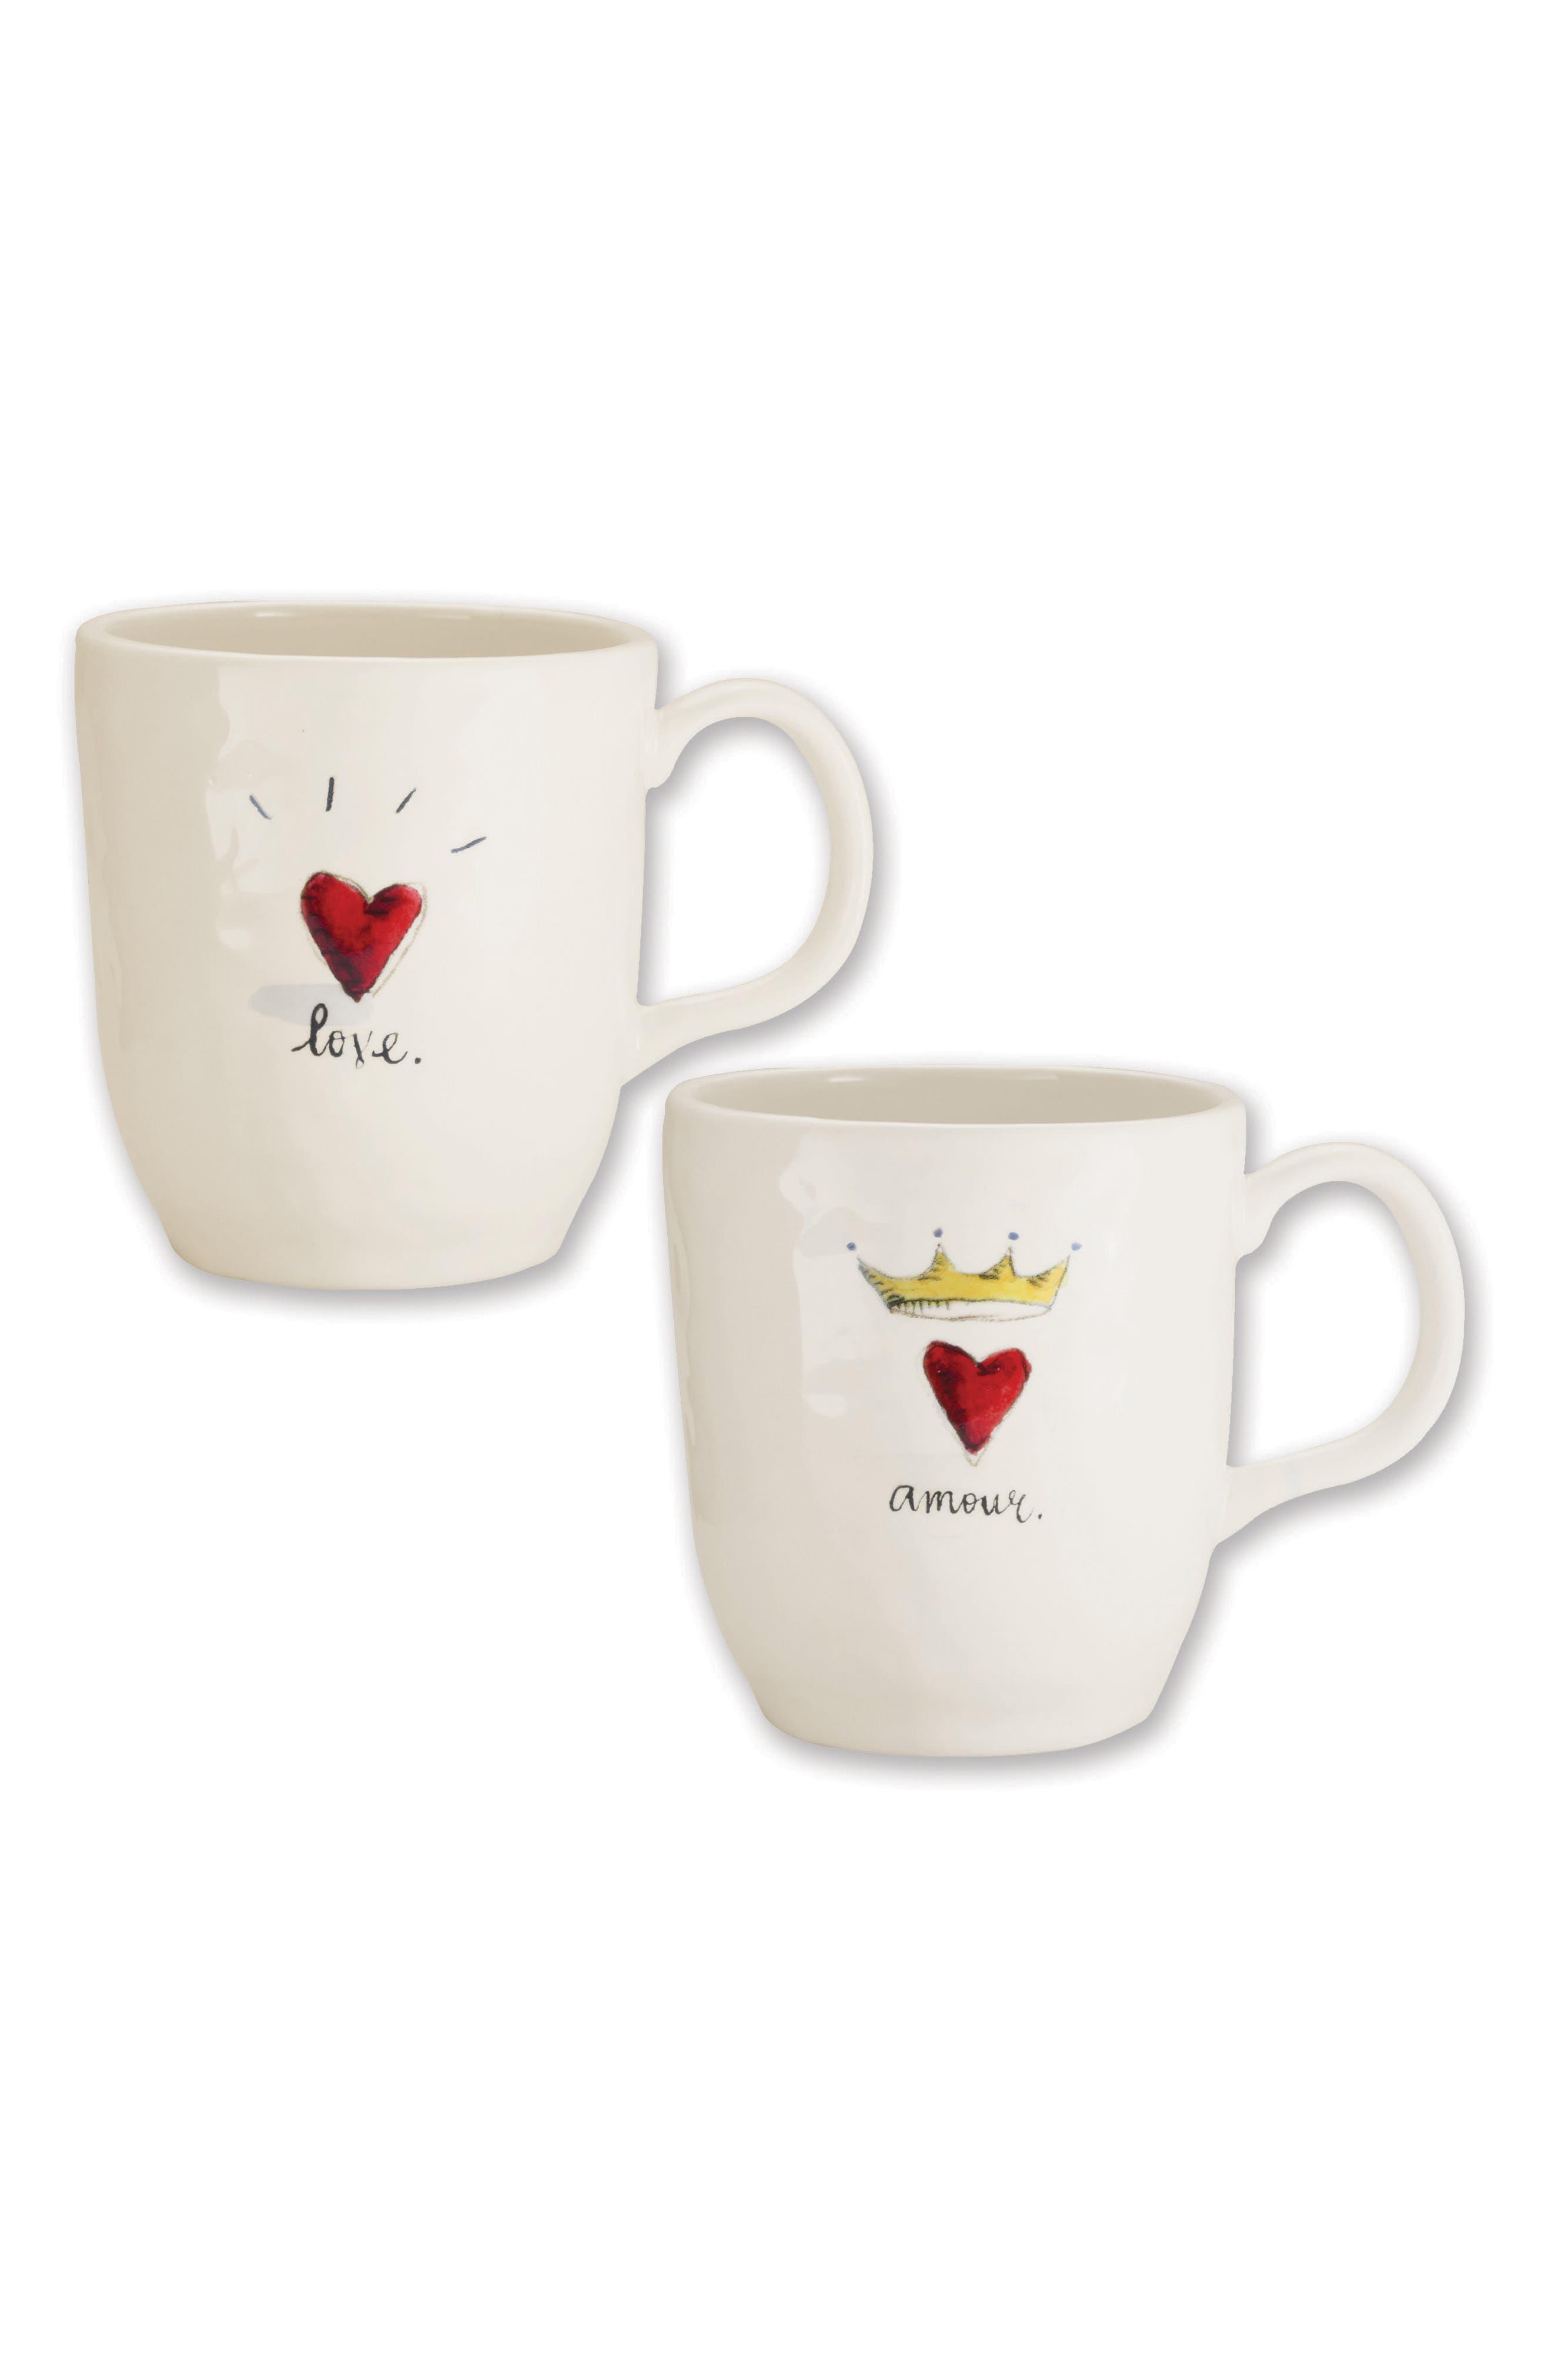 Rae Dunn Love & Amour Set of 2 Ceramic Mugs